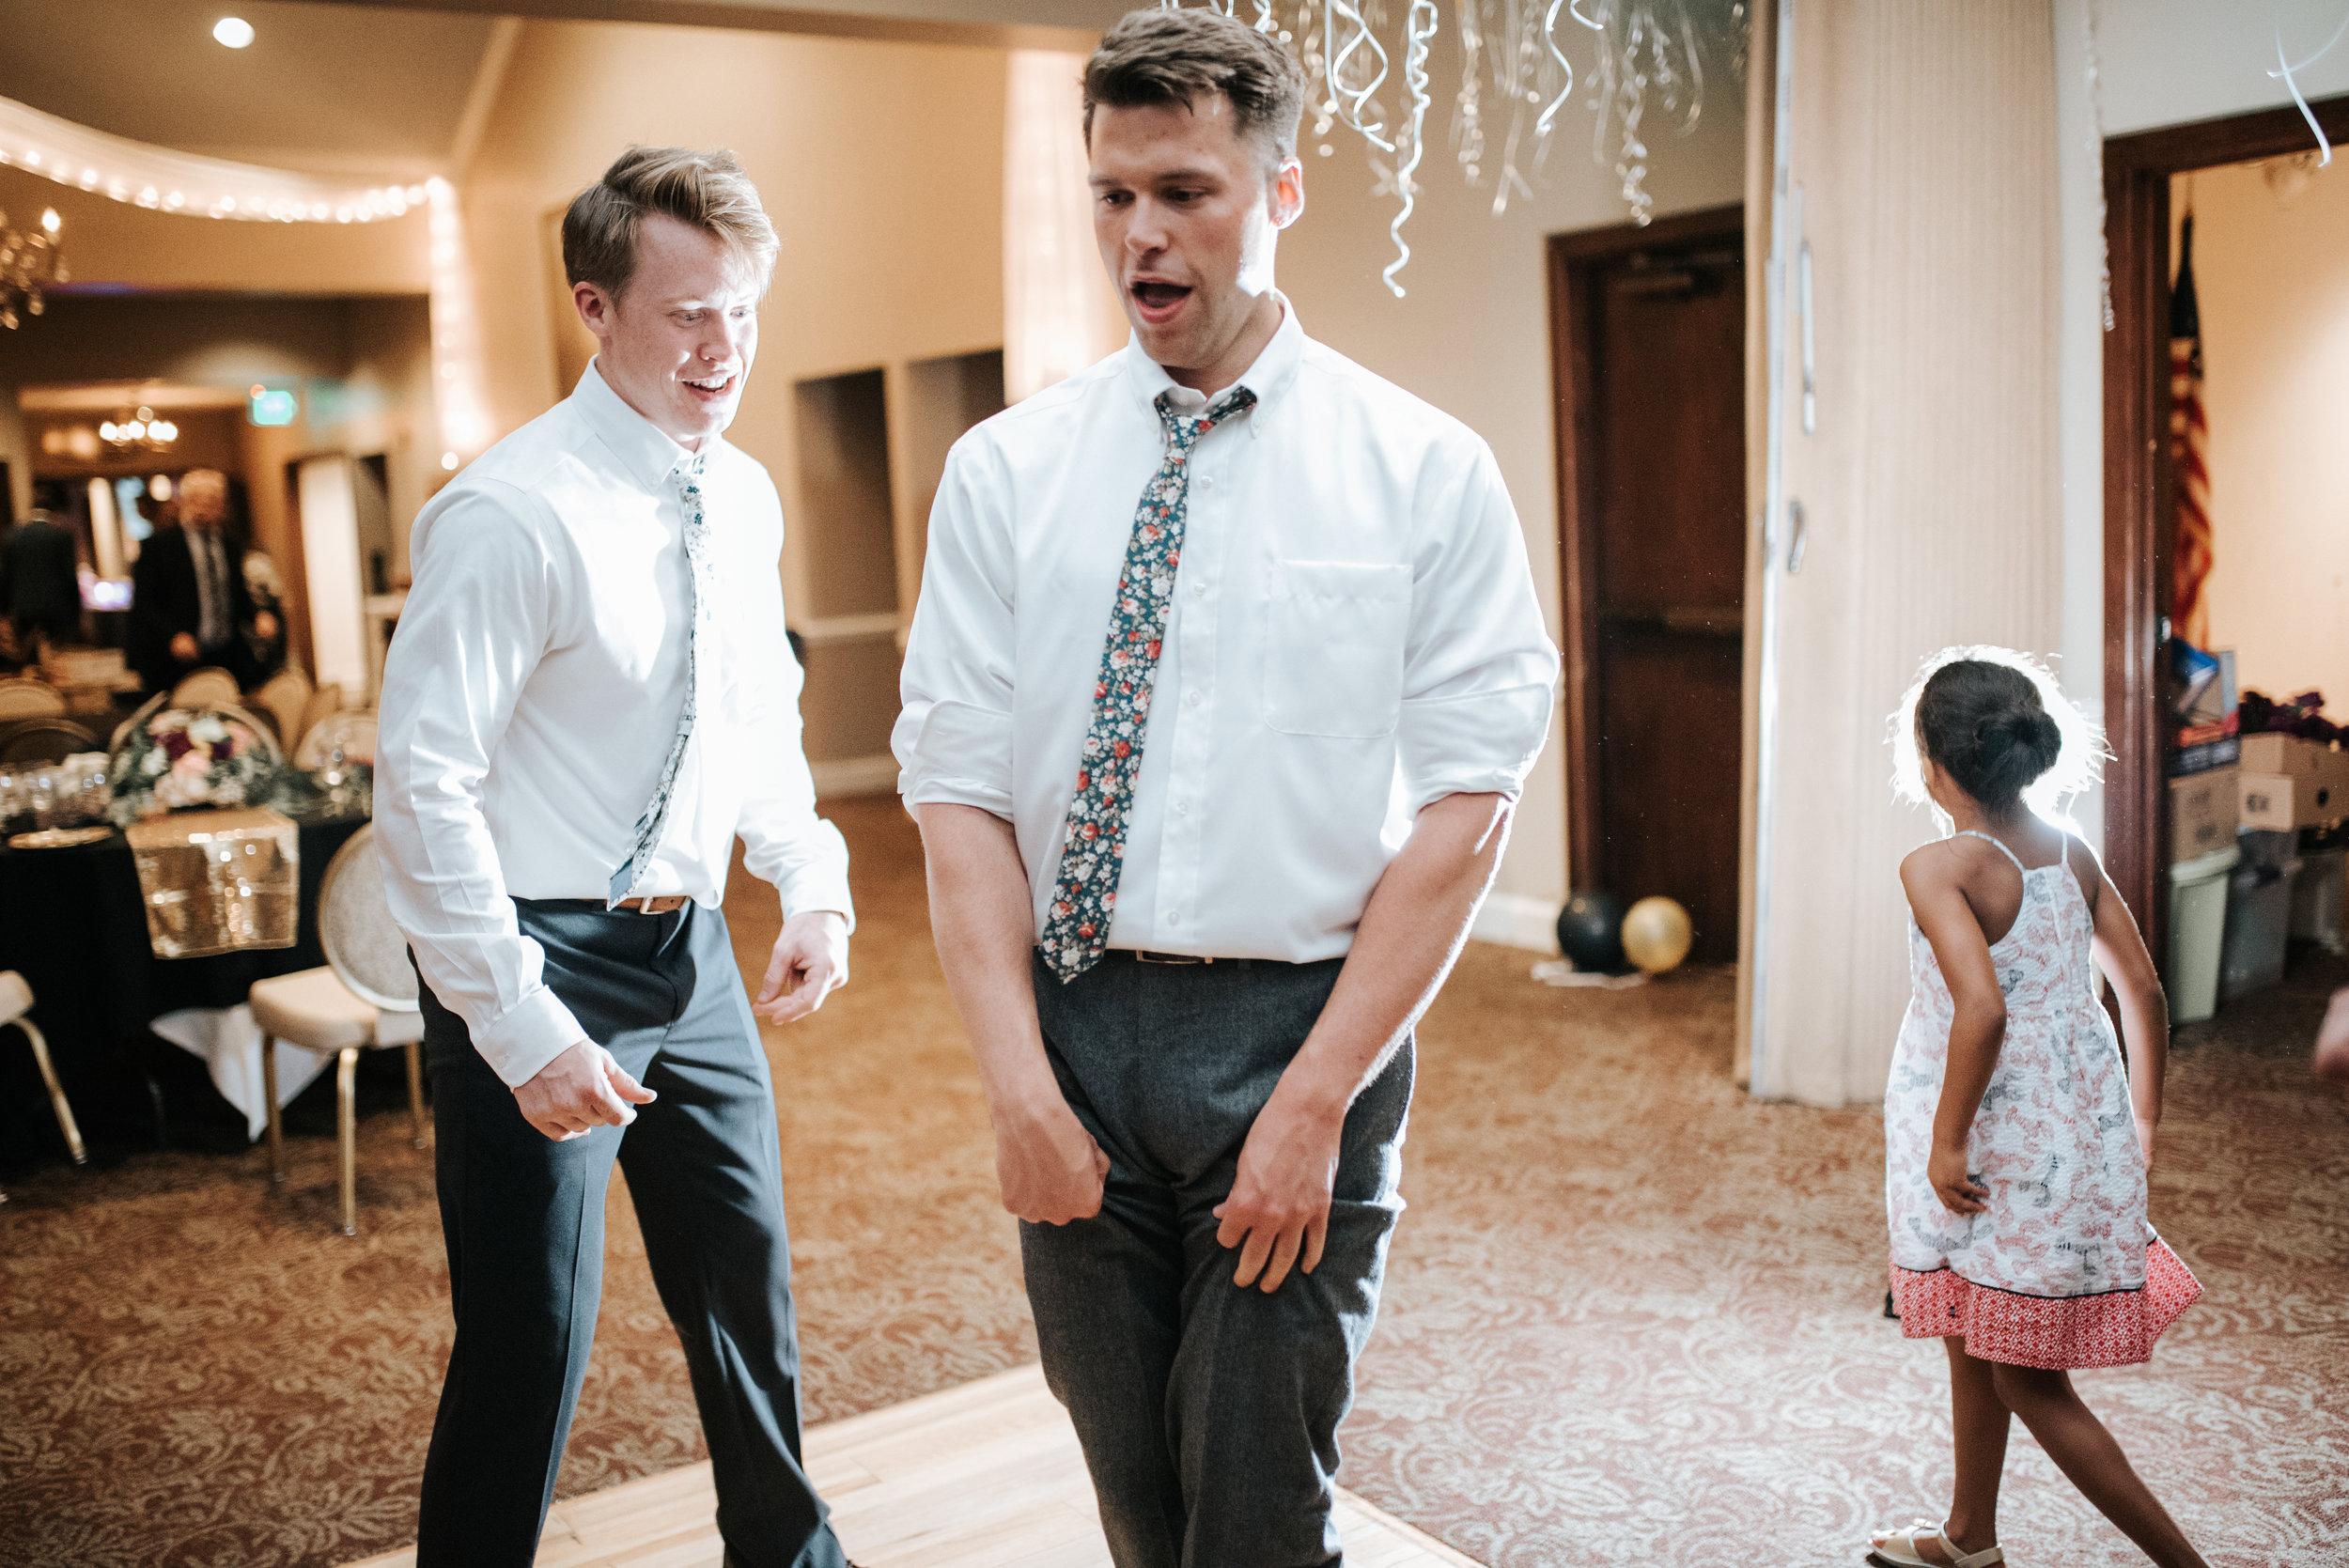 zayda-collin-panama-city-wedding-photography-trippy-bohemian-lisa-frank-wedding-dancing-party-152.jpg